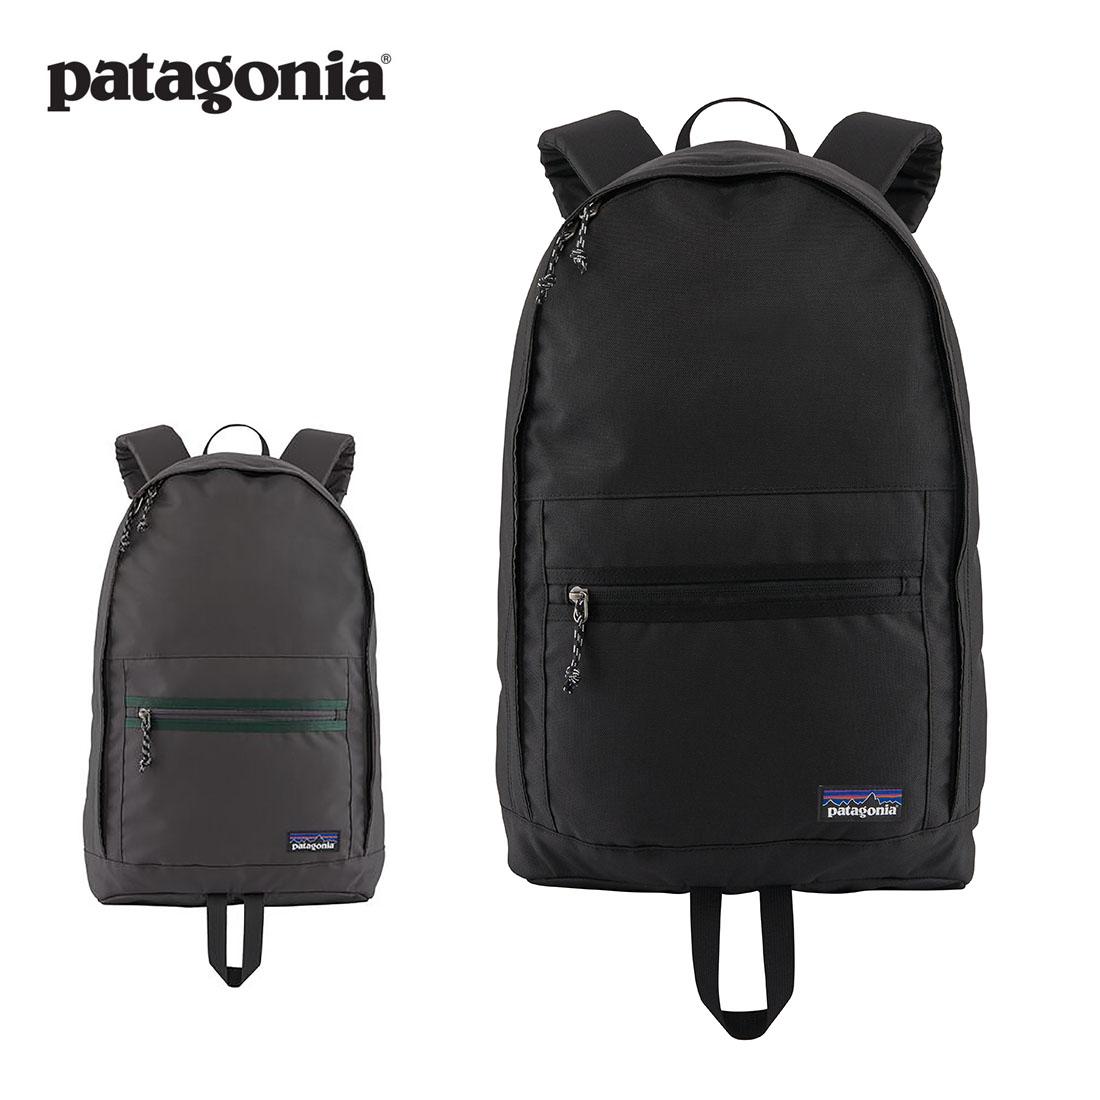 Patagonia パタゴニア  Arbor Daypack 20L アーバー・デイパック(20L)リュックサック メール便不可 48016【送料無料】